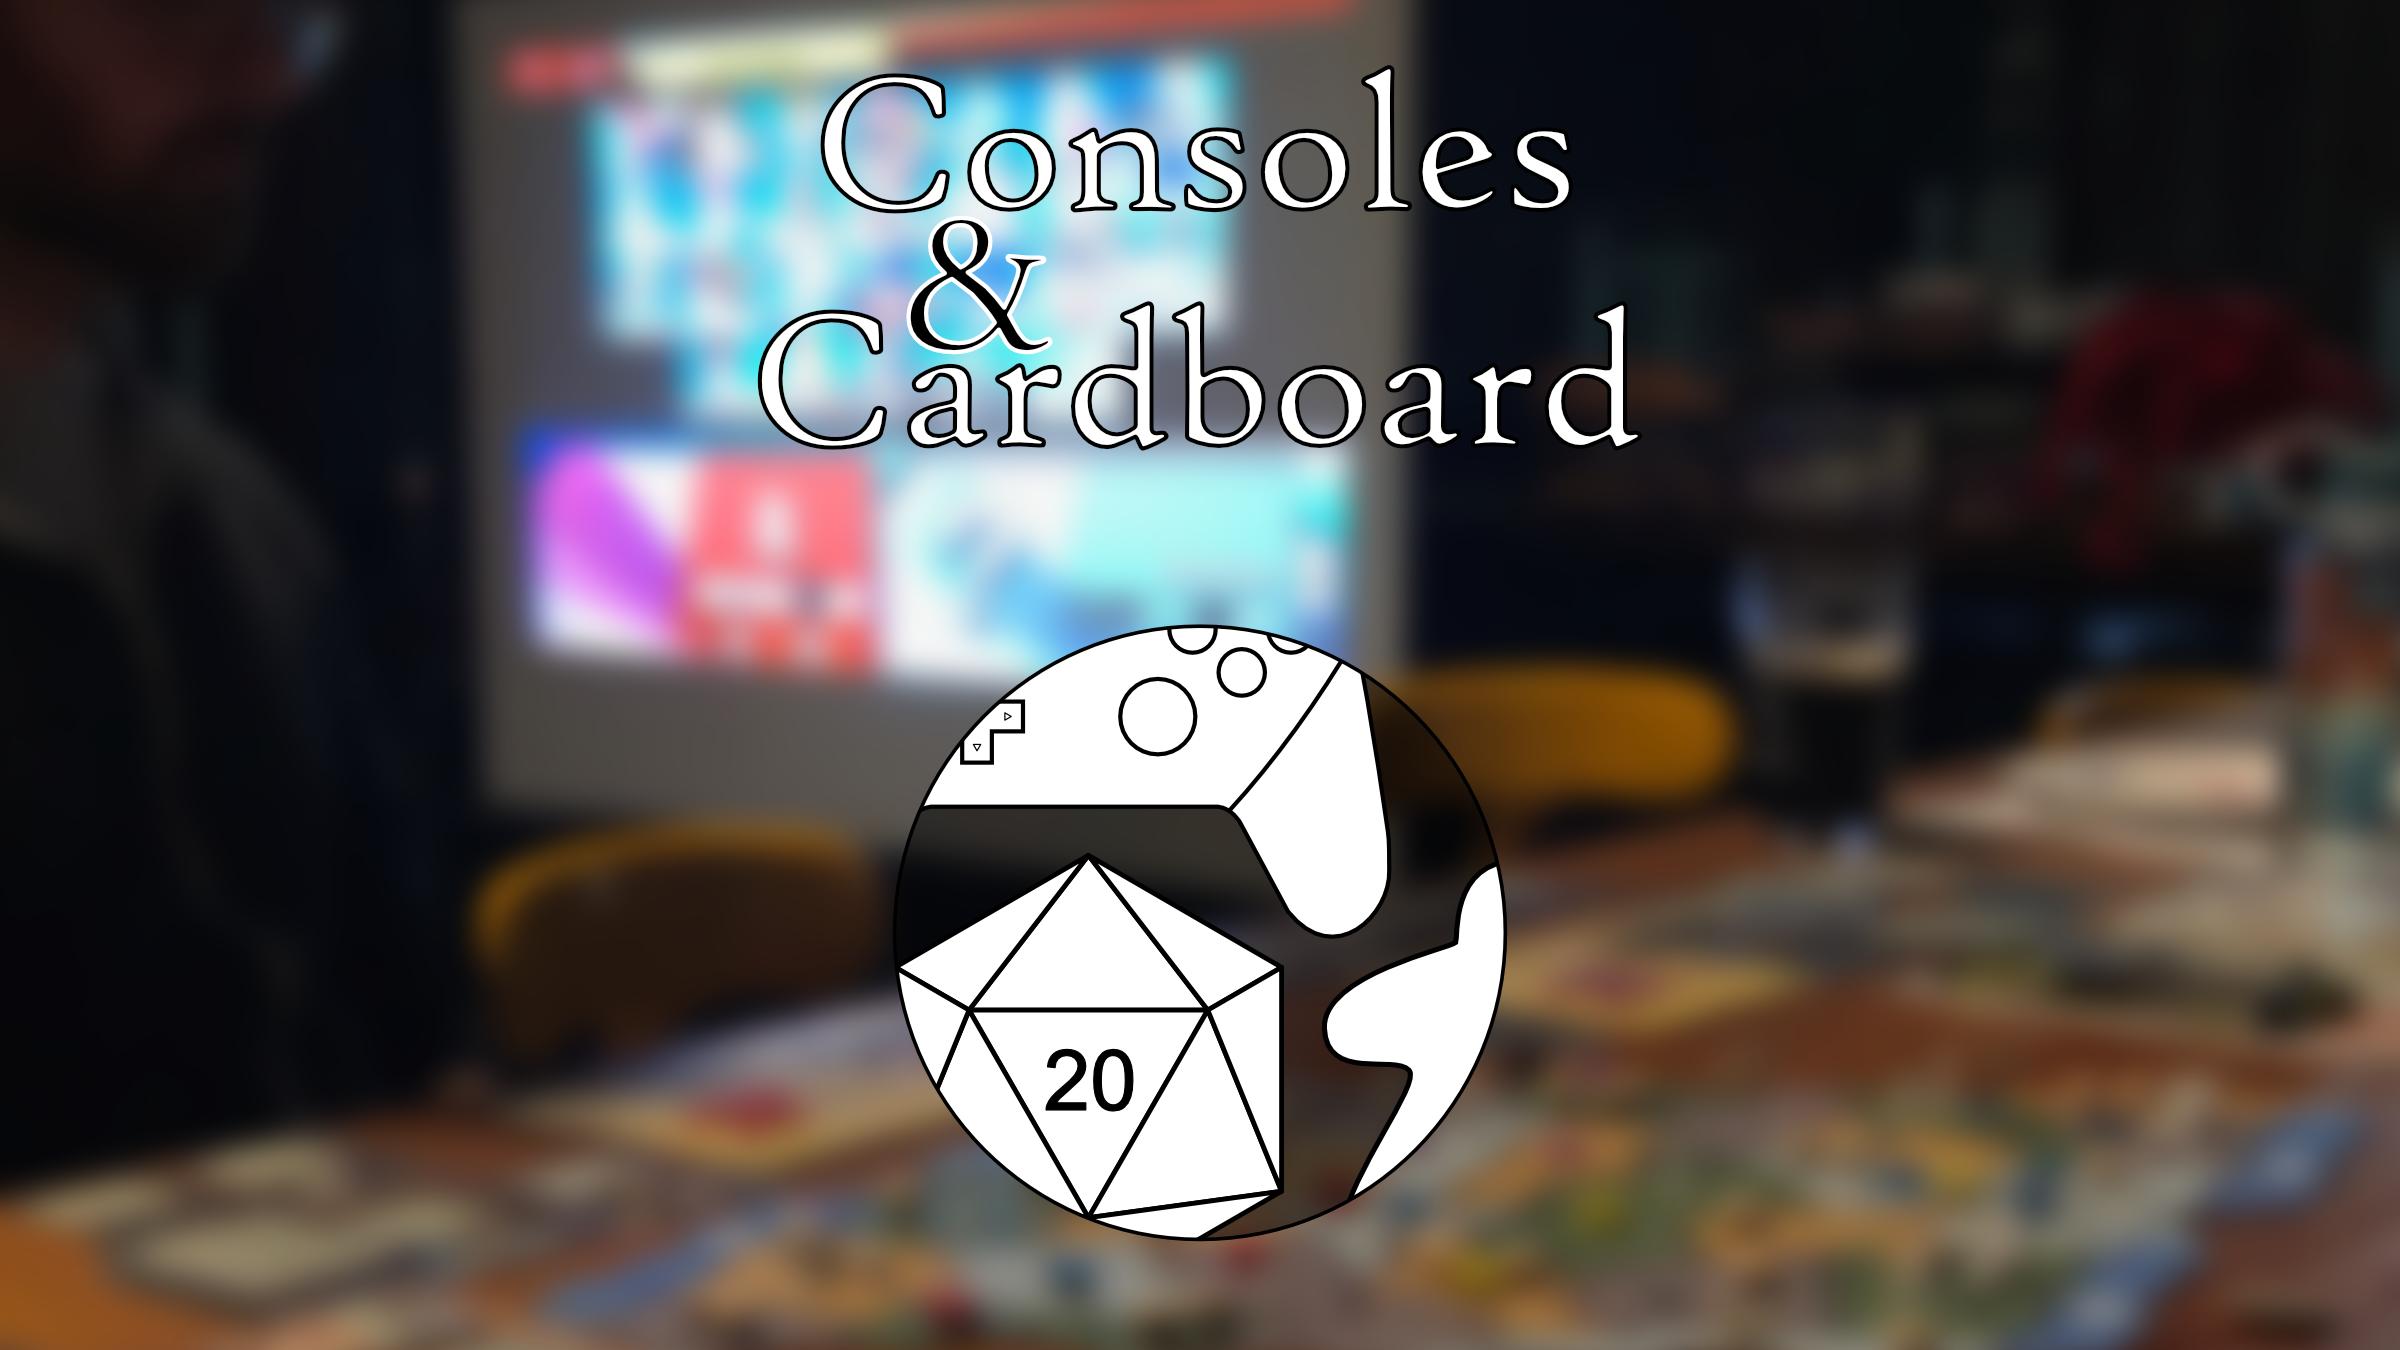 Consoles & Cardboard